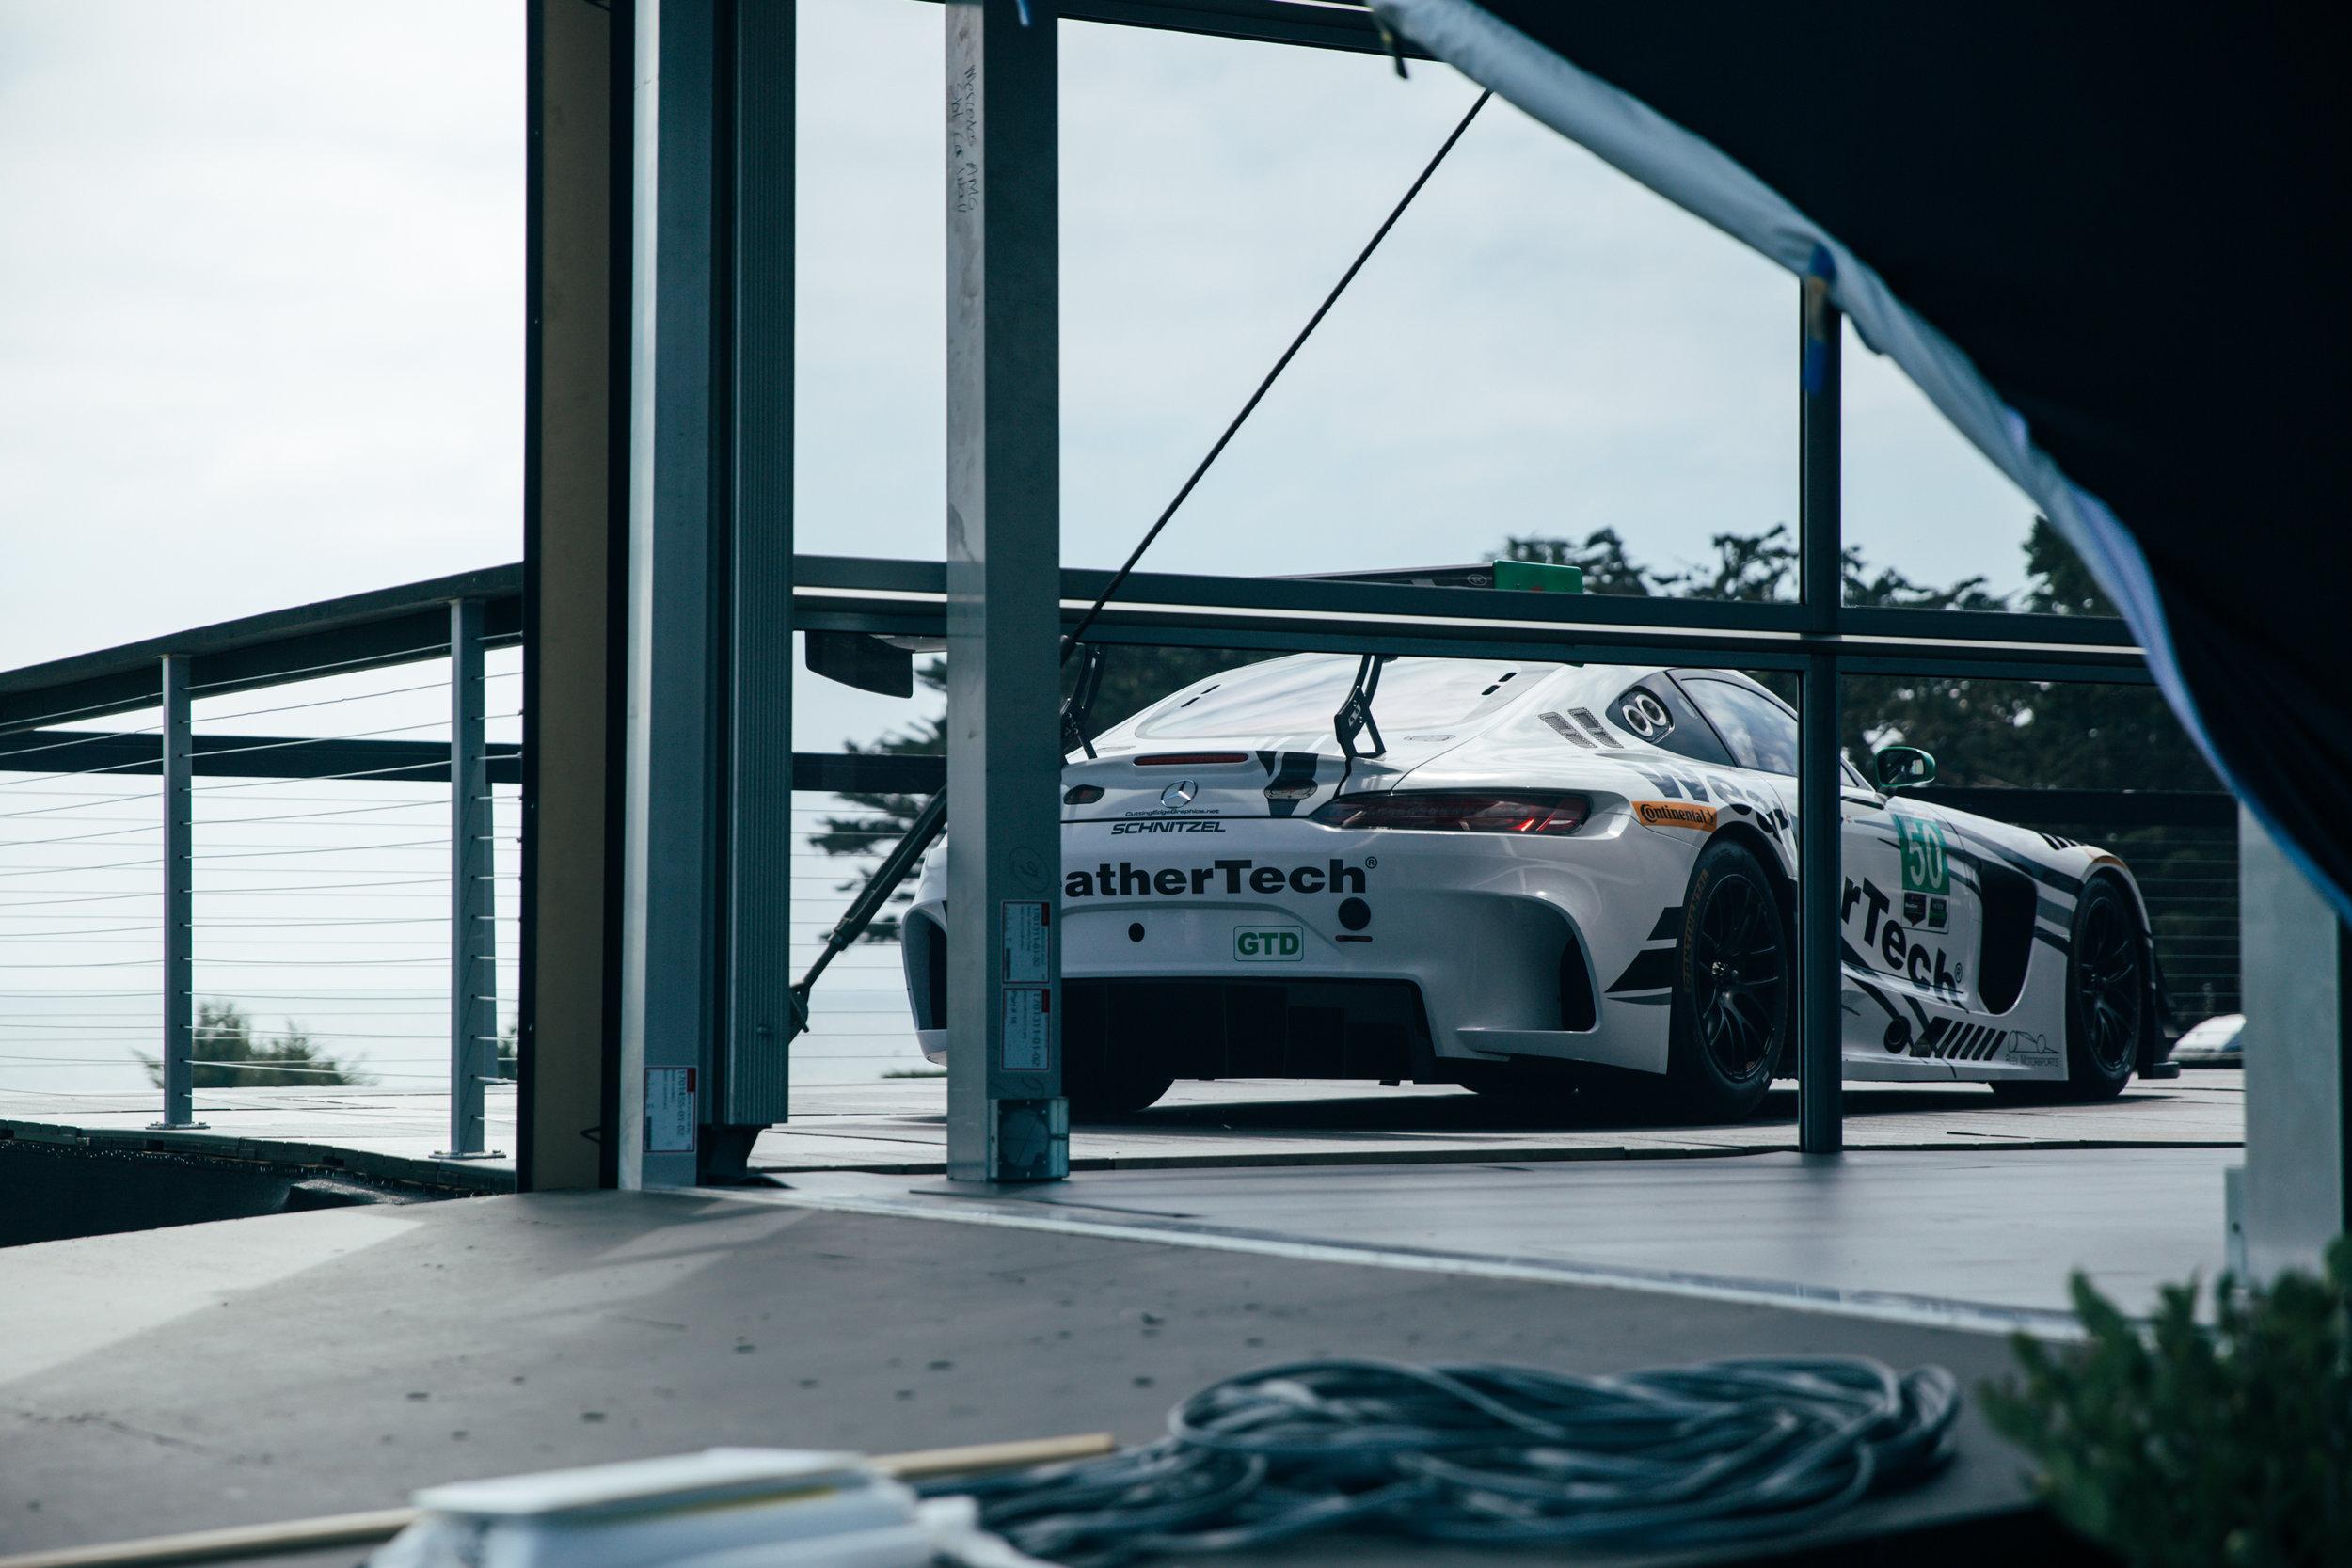 Stay_Driven_Monterey_Car_Week_1-13.jpg